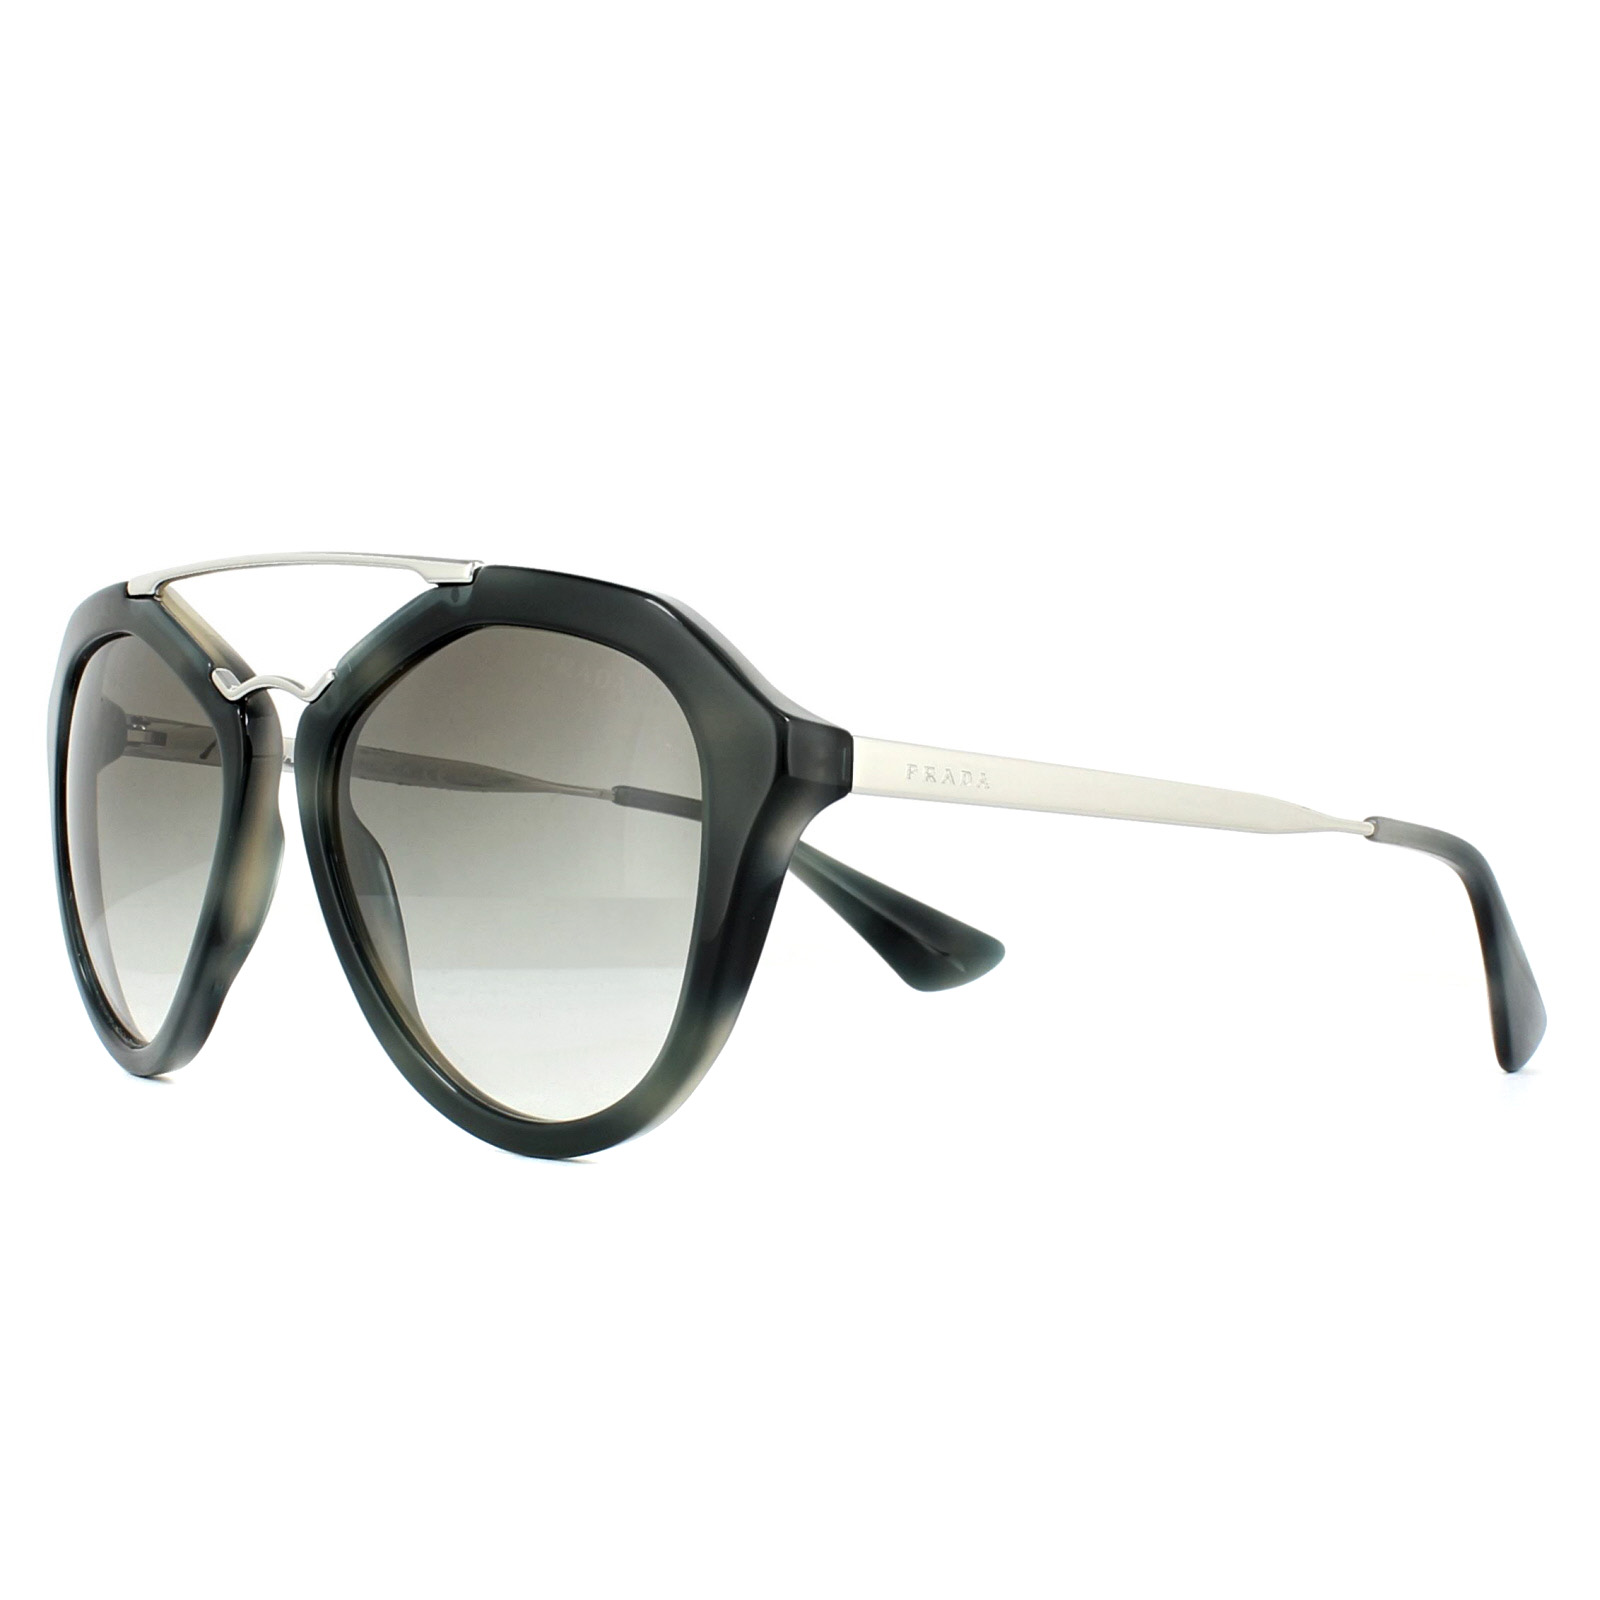 6c24399e8a Sentinel Prada Sunglasses Cinema 12QS USI0A7 Striped Grey Grey Gradient